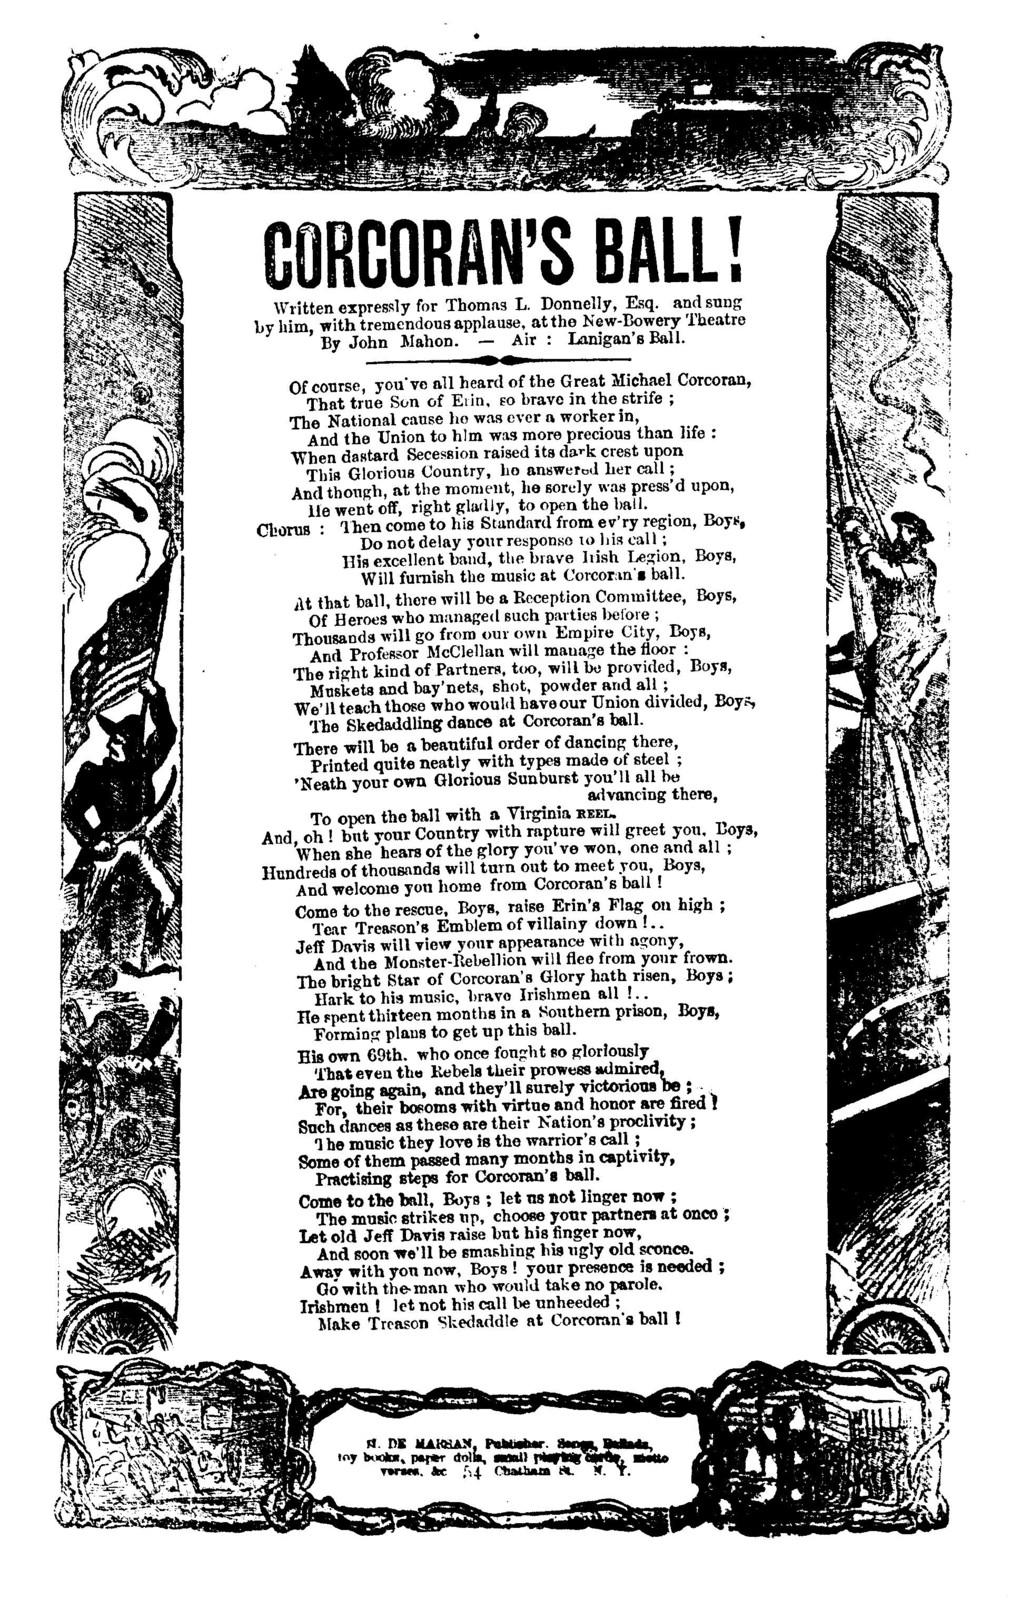 Corcoran's ball! By John Mahon. Air: Lanigan's ball. H. De Marsan, Publisher, ... 54 Chatham St., N. Y